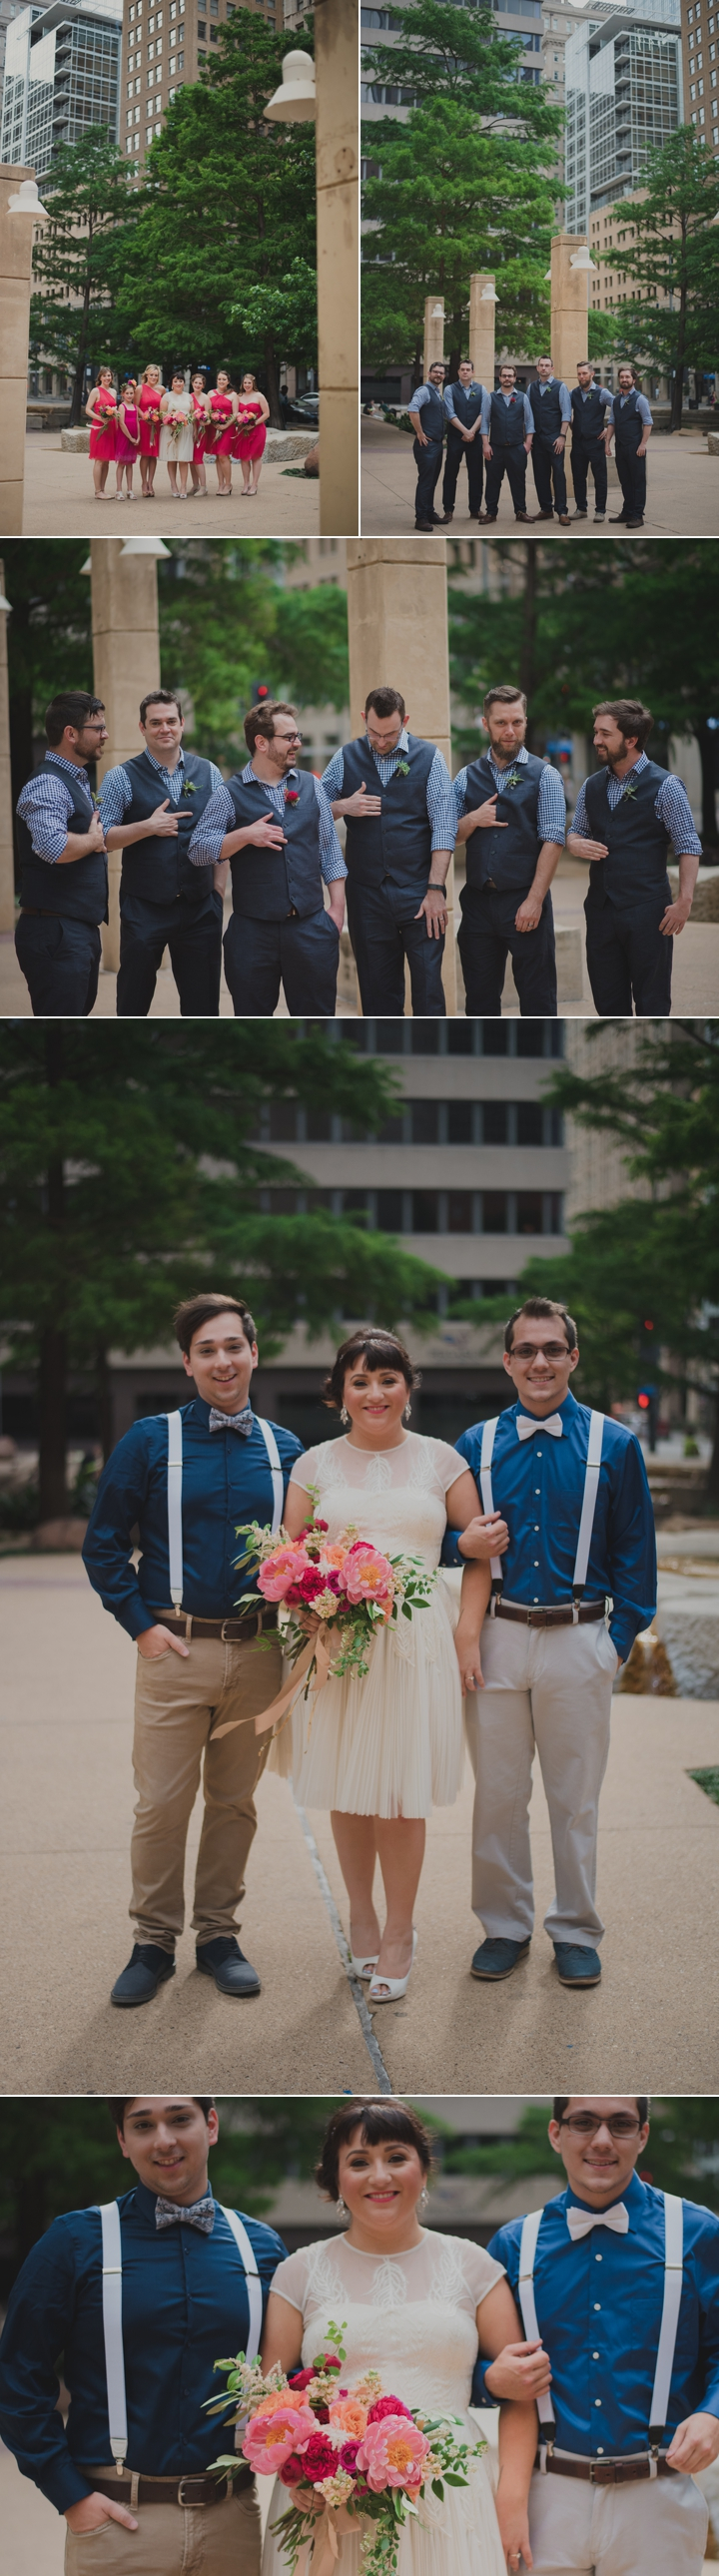 dallas-wedding-photographer-hw 10.jpg